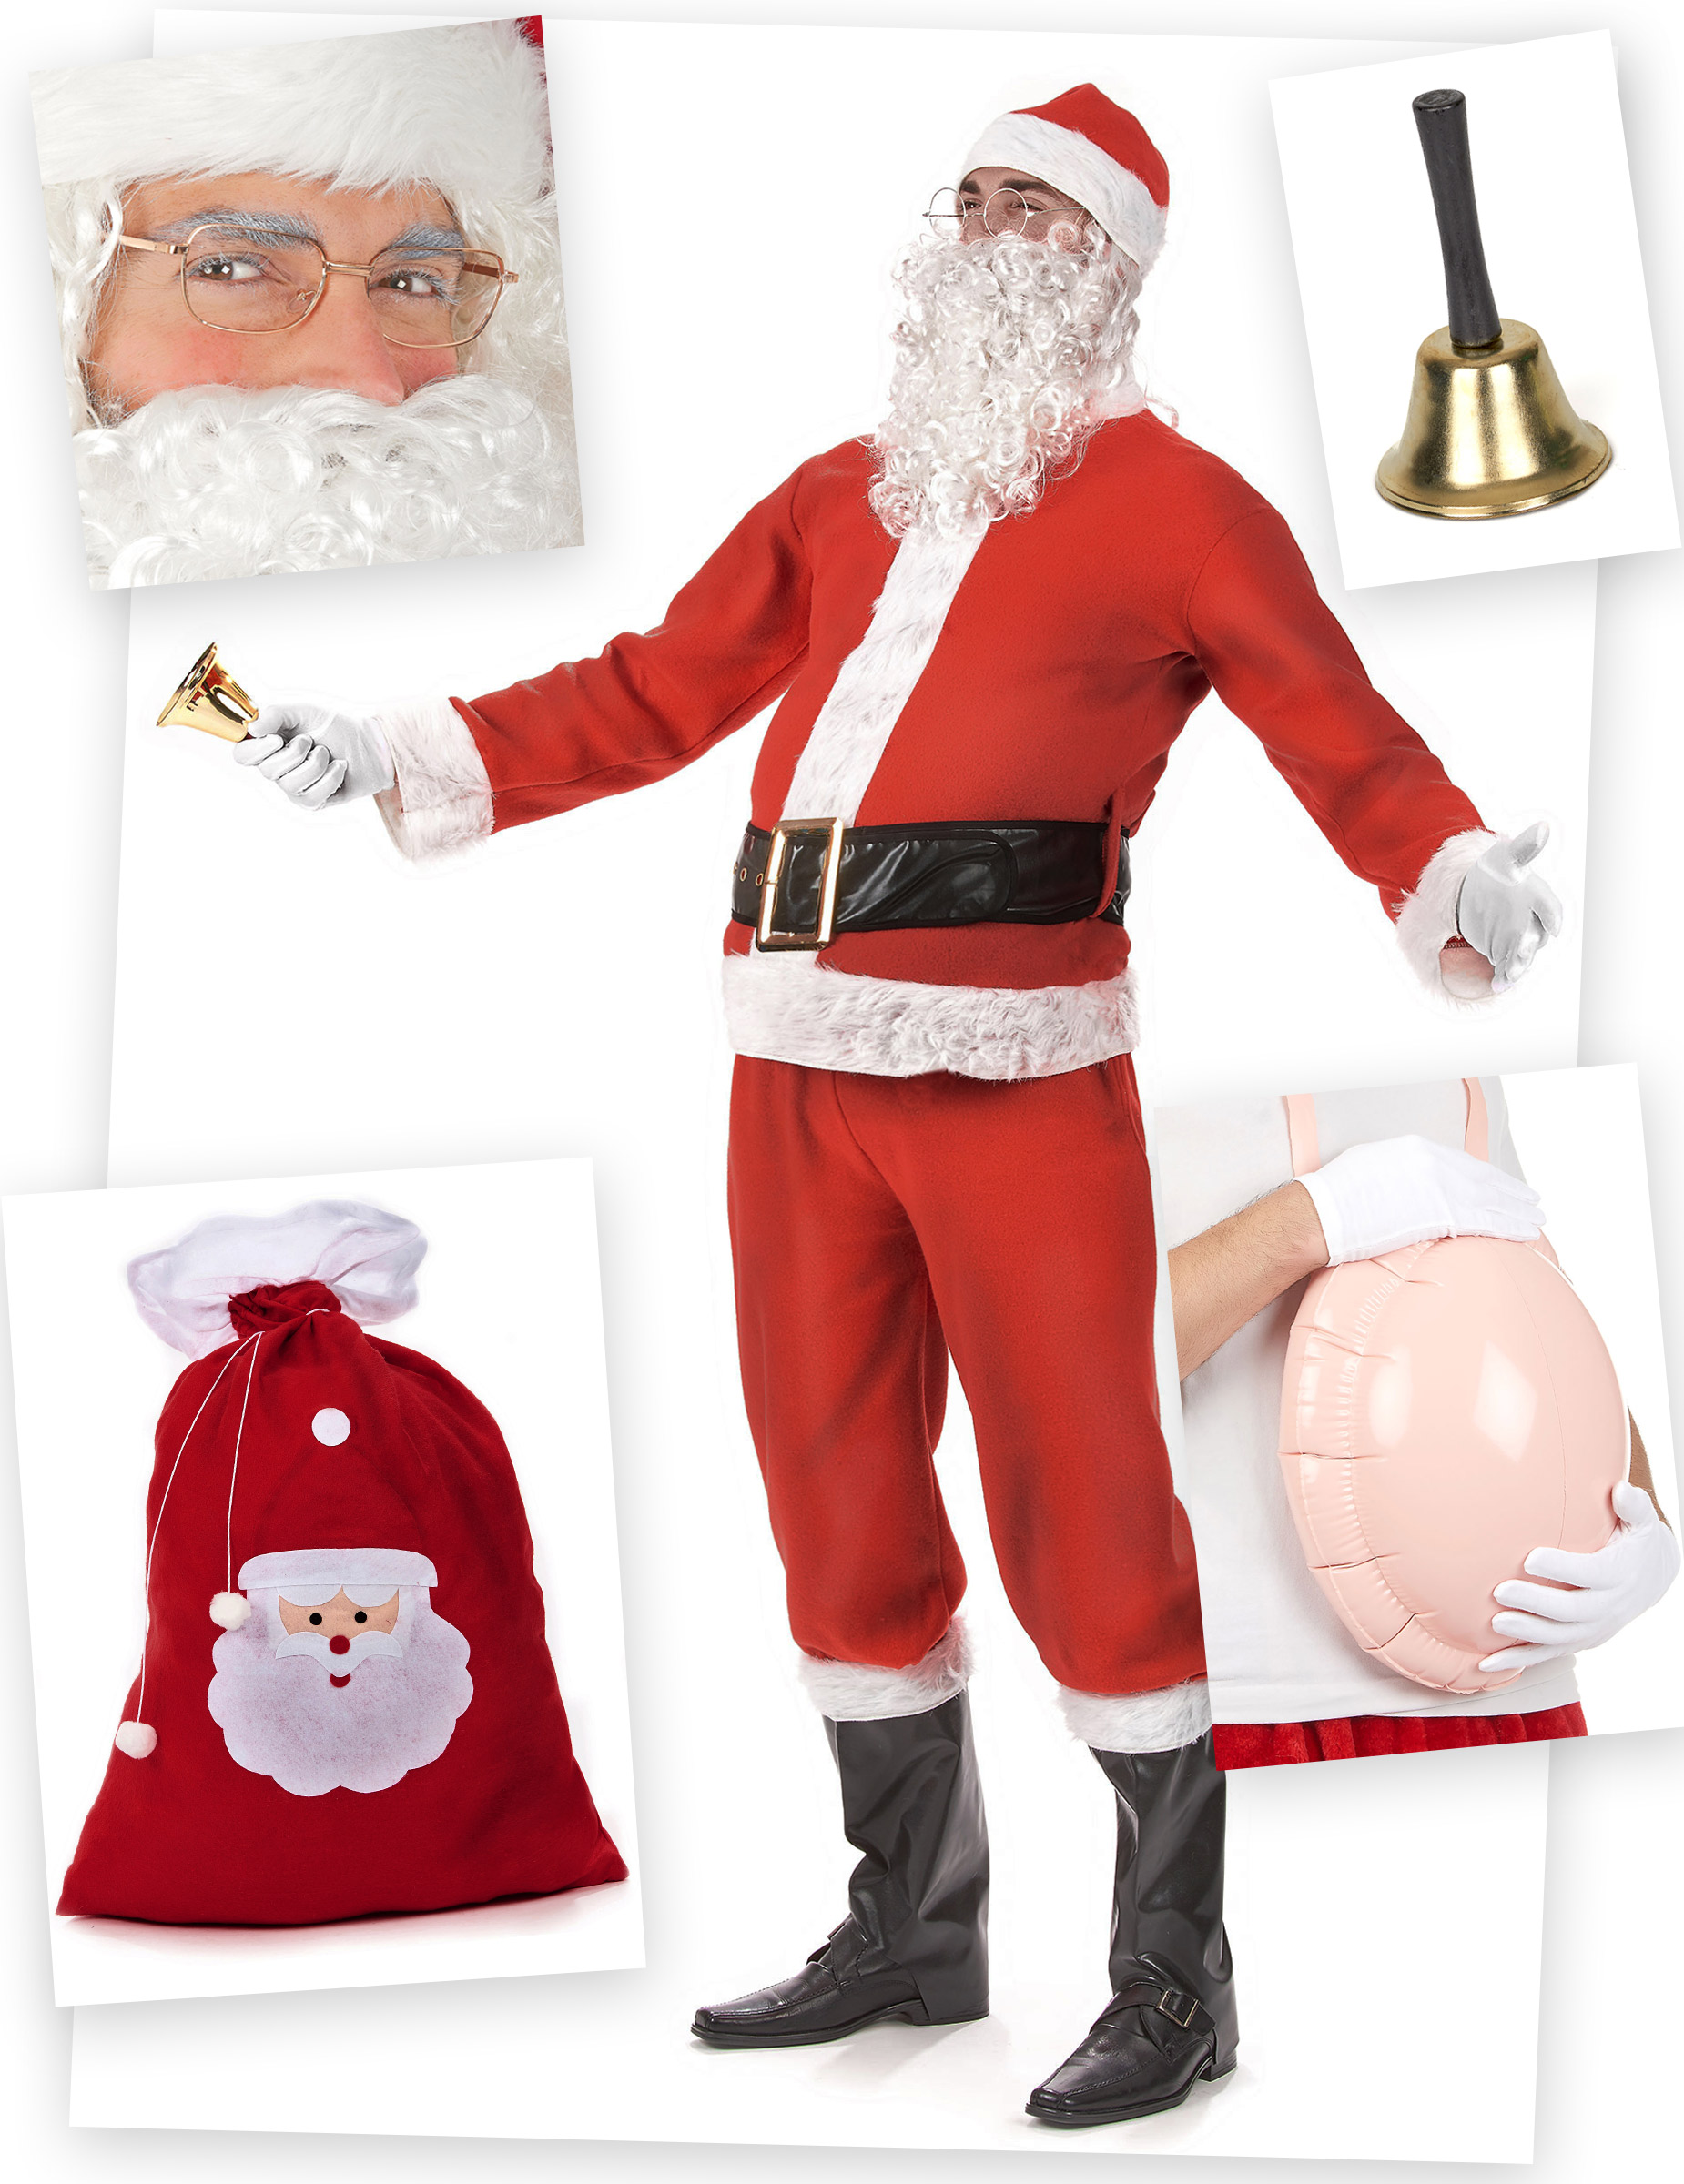 weihnachtsmann kost mset 11 teilig rot weiss g nstige. Black Bedroom Furniture Sets. Home Design Ideas